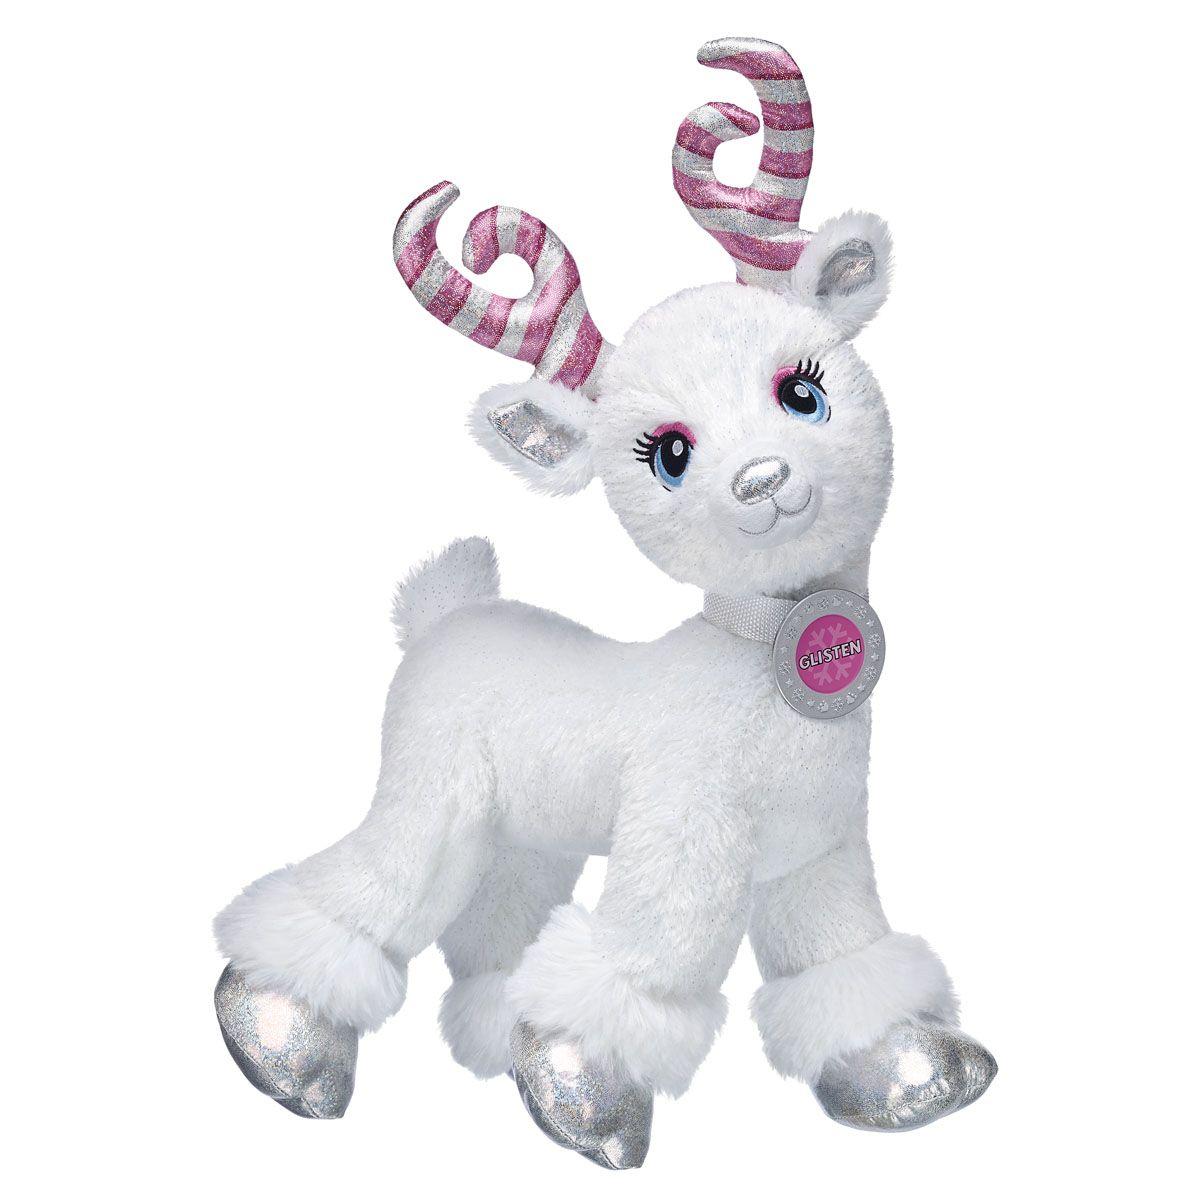 Candy Cane Glisten Build A Bear Reindeer Custom Stuffed Animal Teddy Bear Gifts